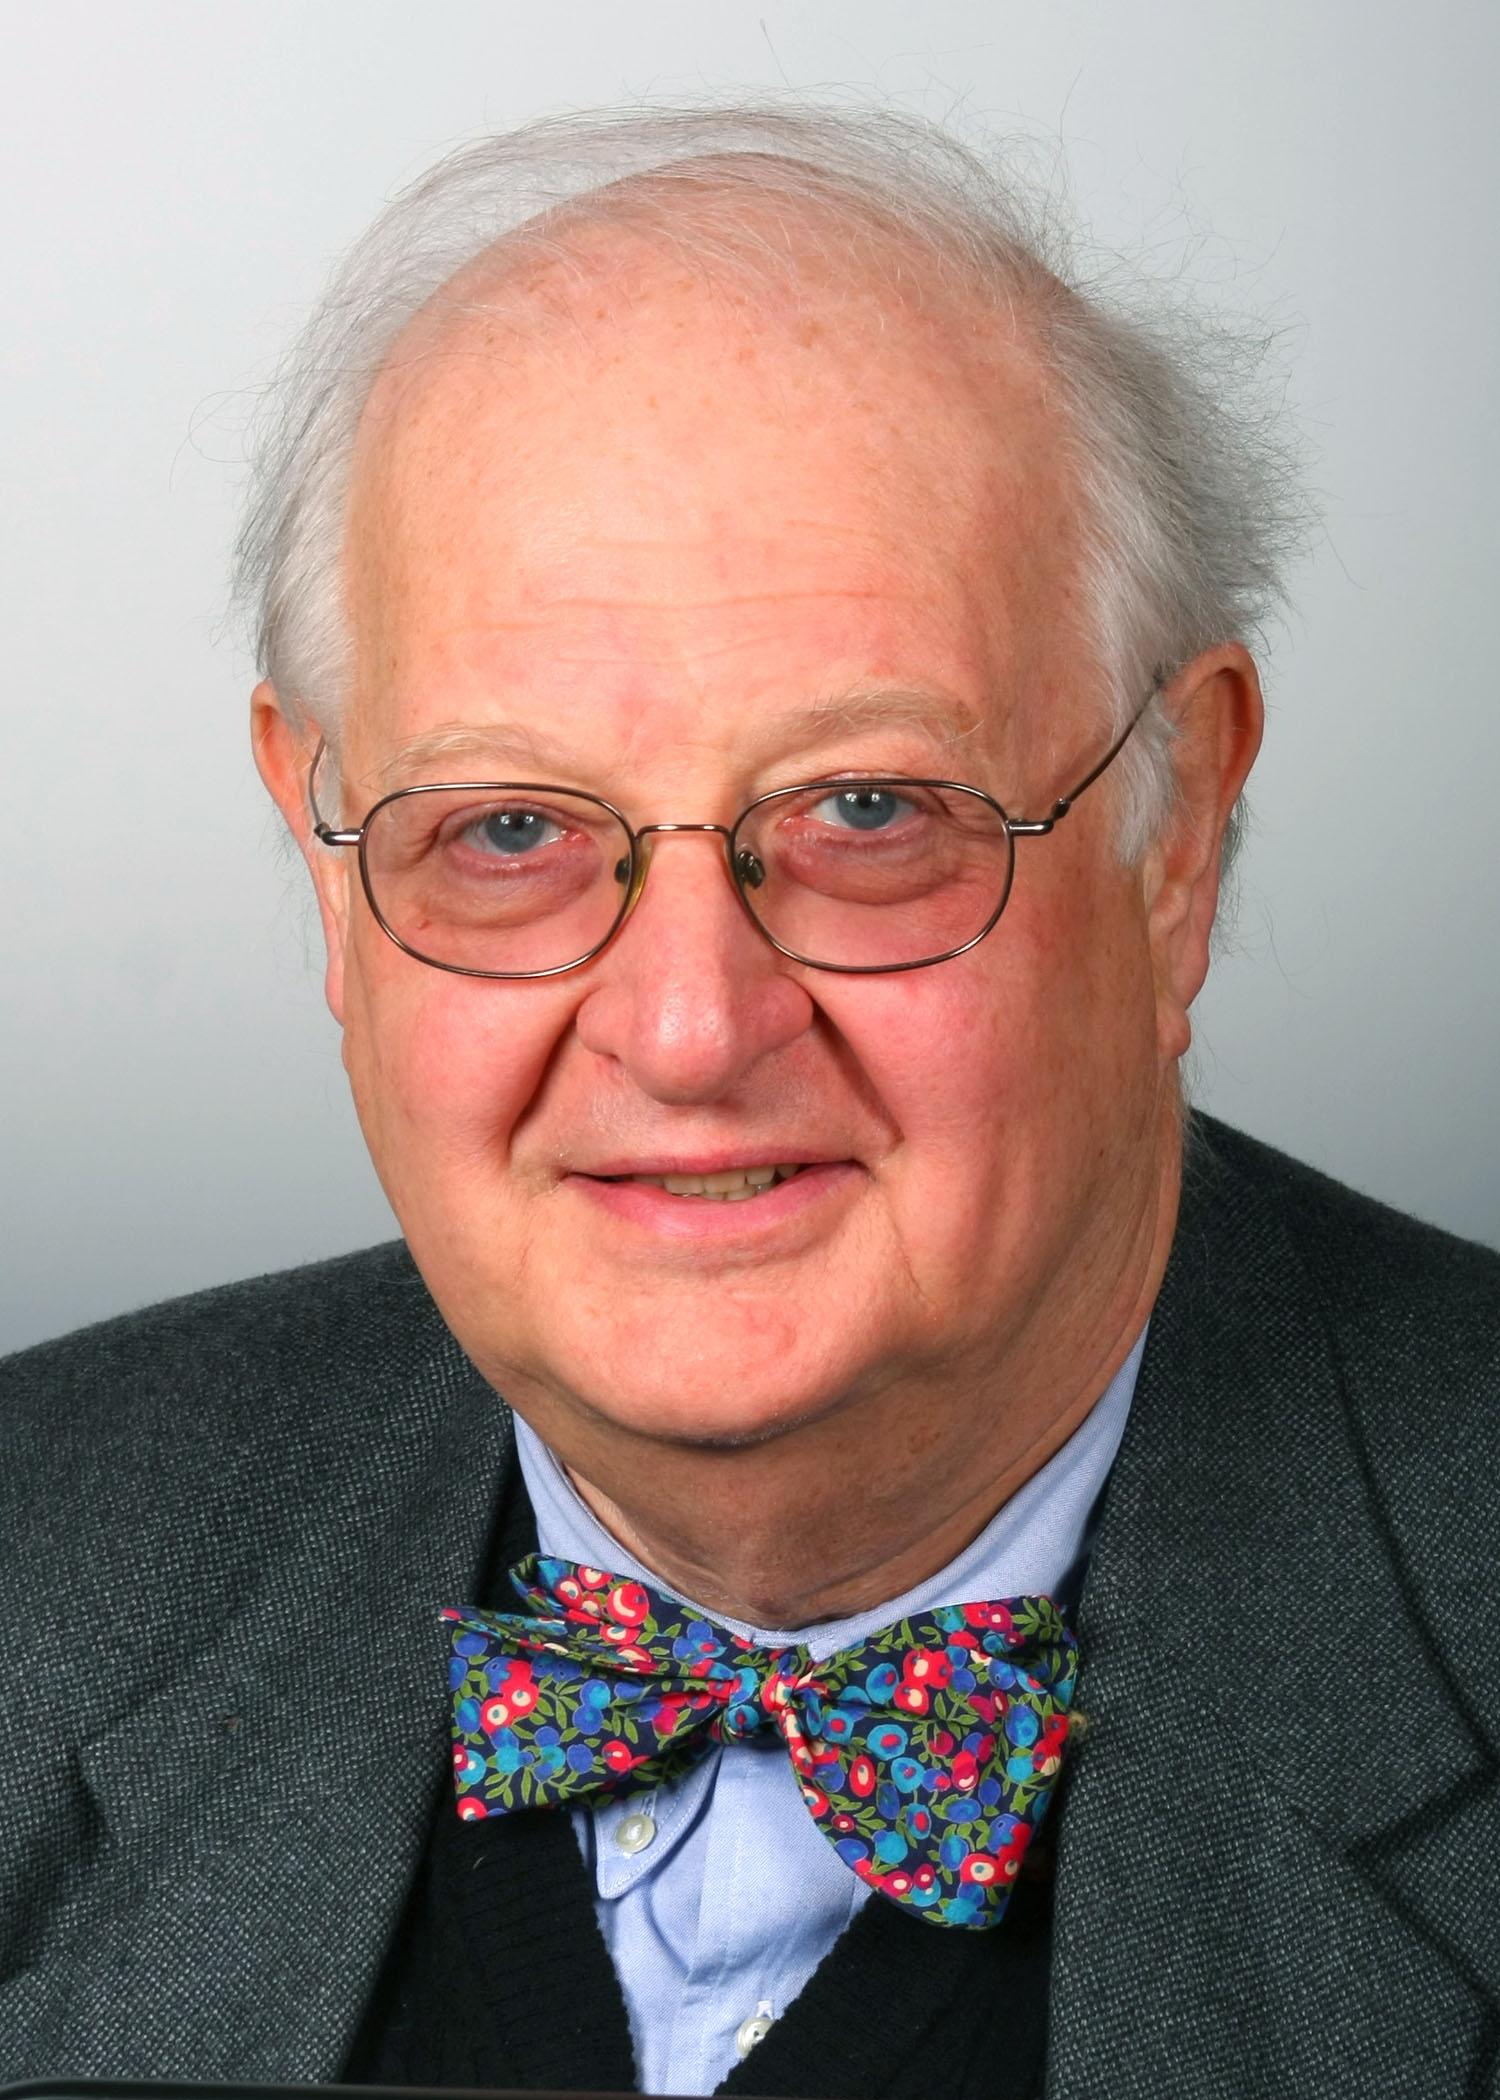 Professor Angus Deaton (www.princeton.edu)